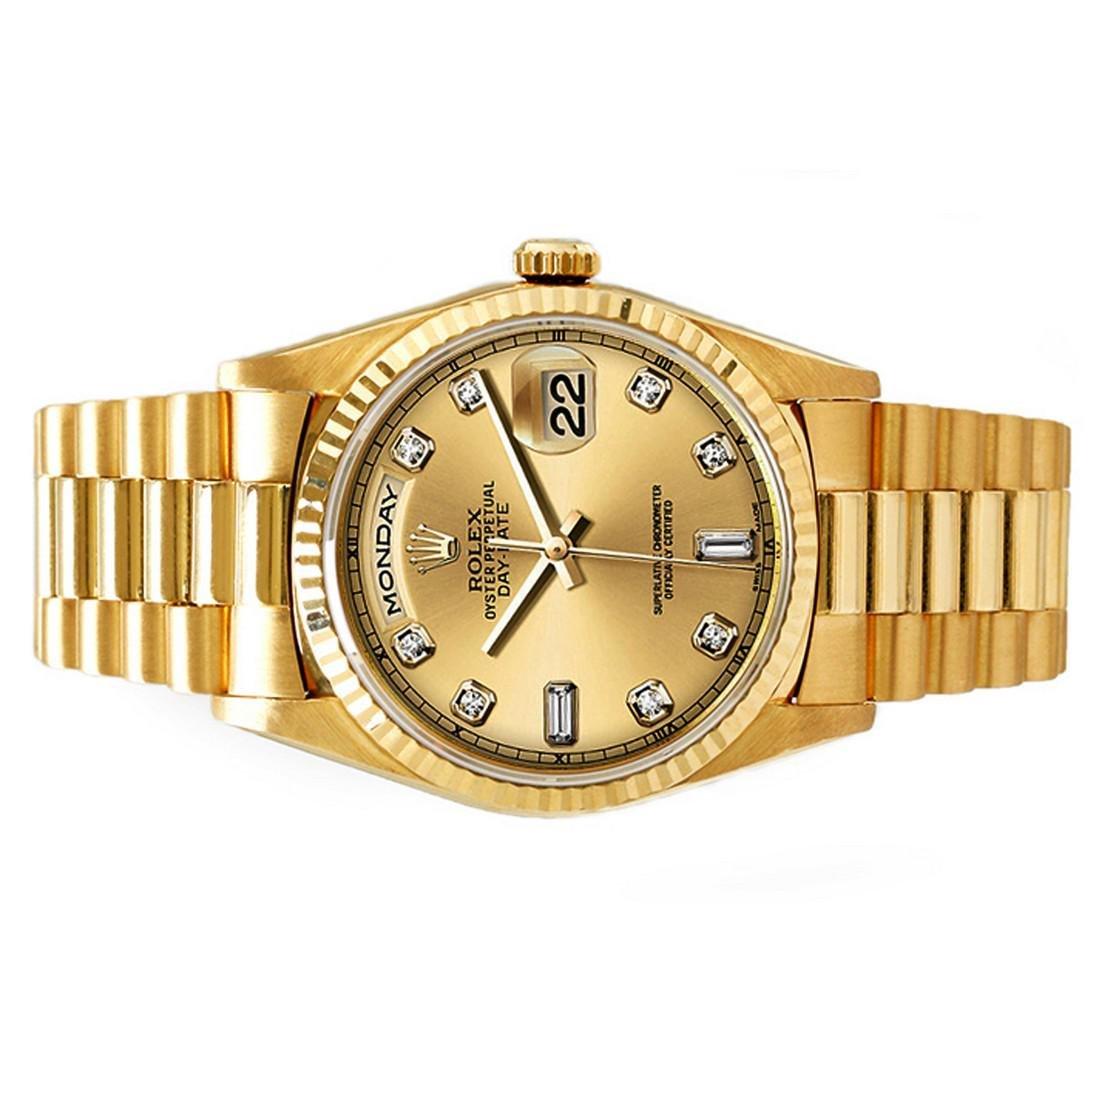 President Day-Date, Rolex with diamond dial, 18 karat